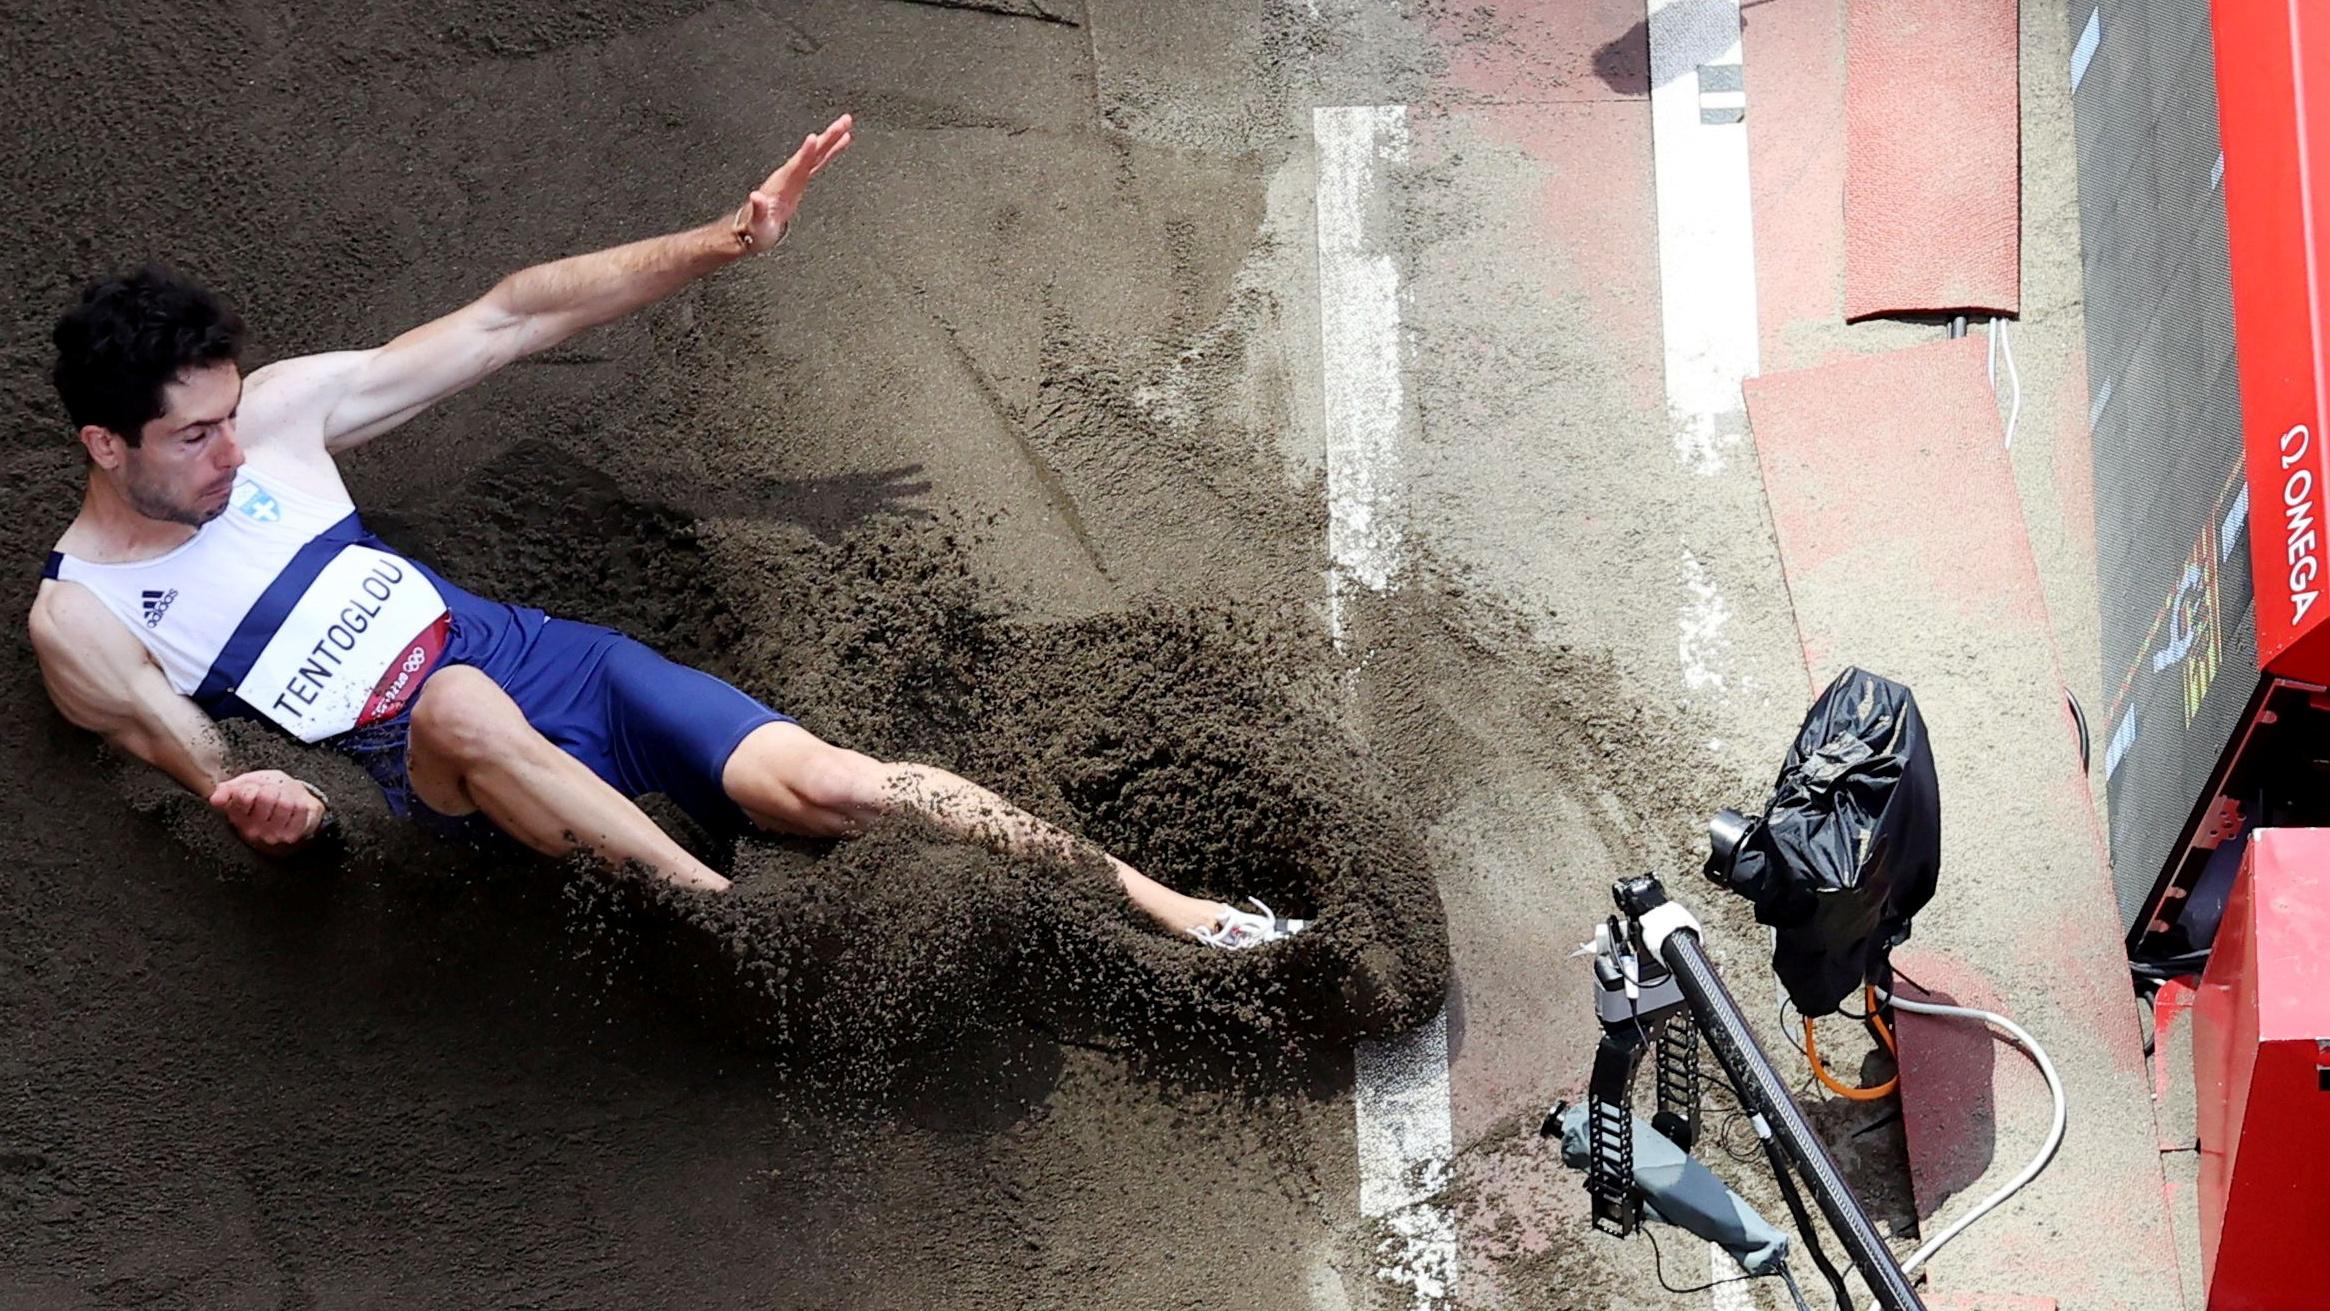 Tokyo 2020 Olympics - Athletics - Men's Long Jump - Final - Olympic Stadium, Tokyo, Japan - August 2, 2021. Miltiadis Tentoglou of Greece in action REUTERS/Athit Perawongmetha